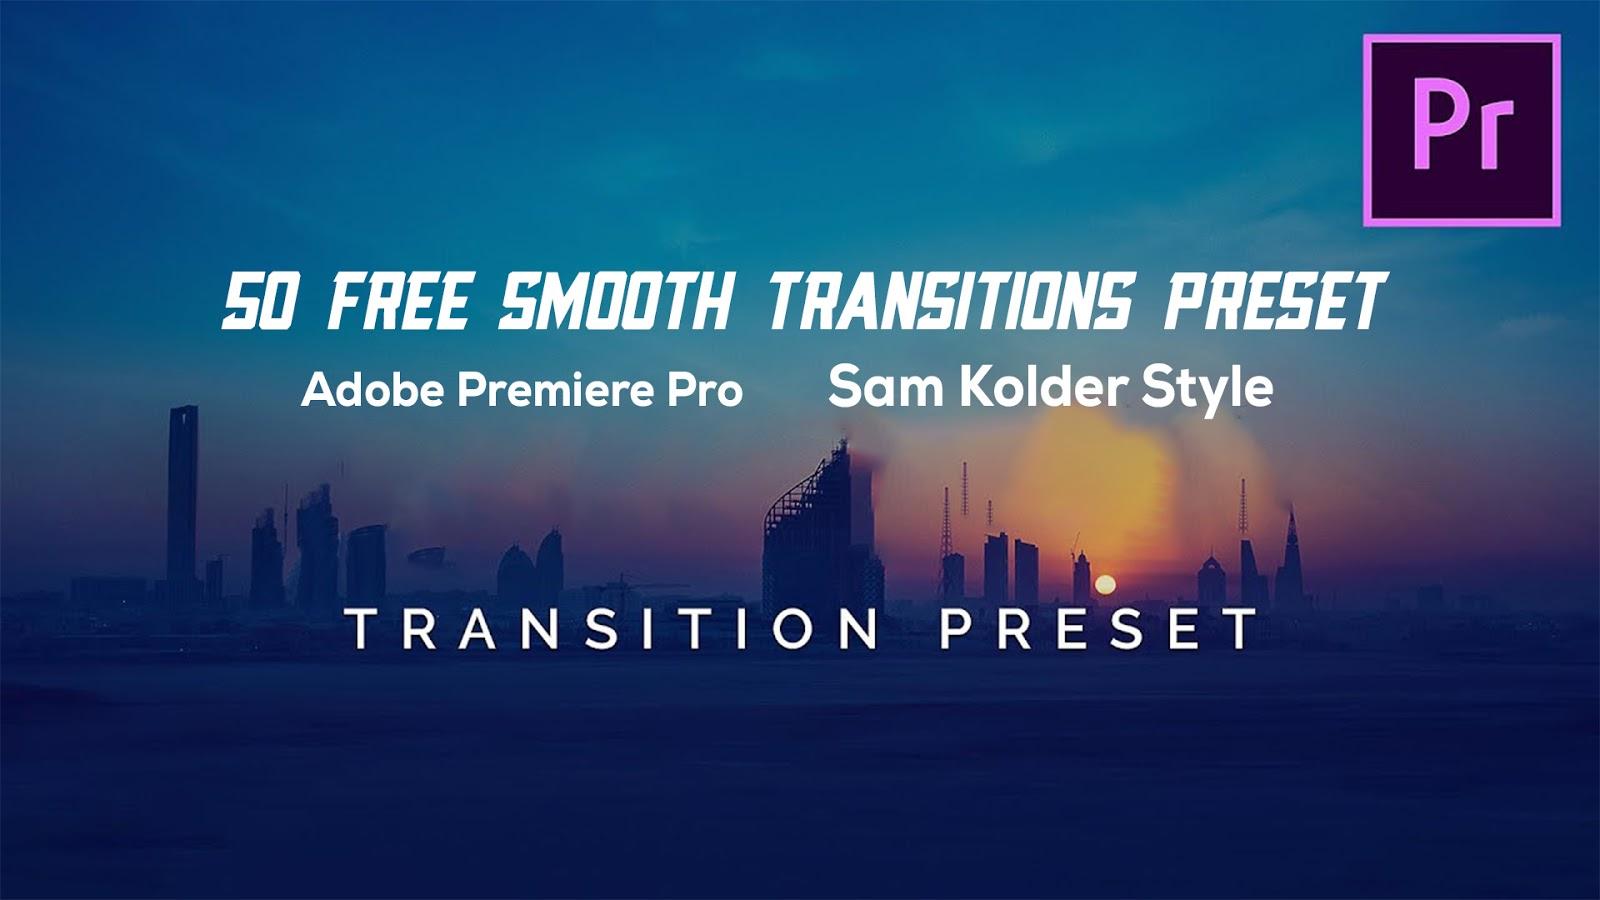 50 Free Smooth Transitions Preset for Adobe Premiere Pro - Sam Kolder Style